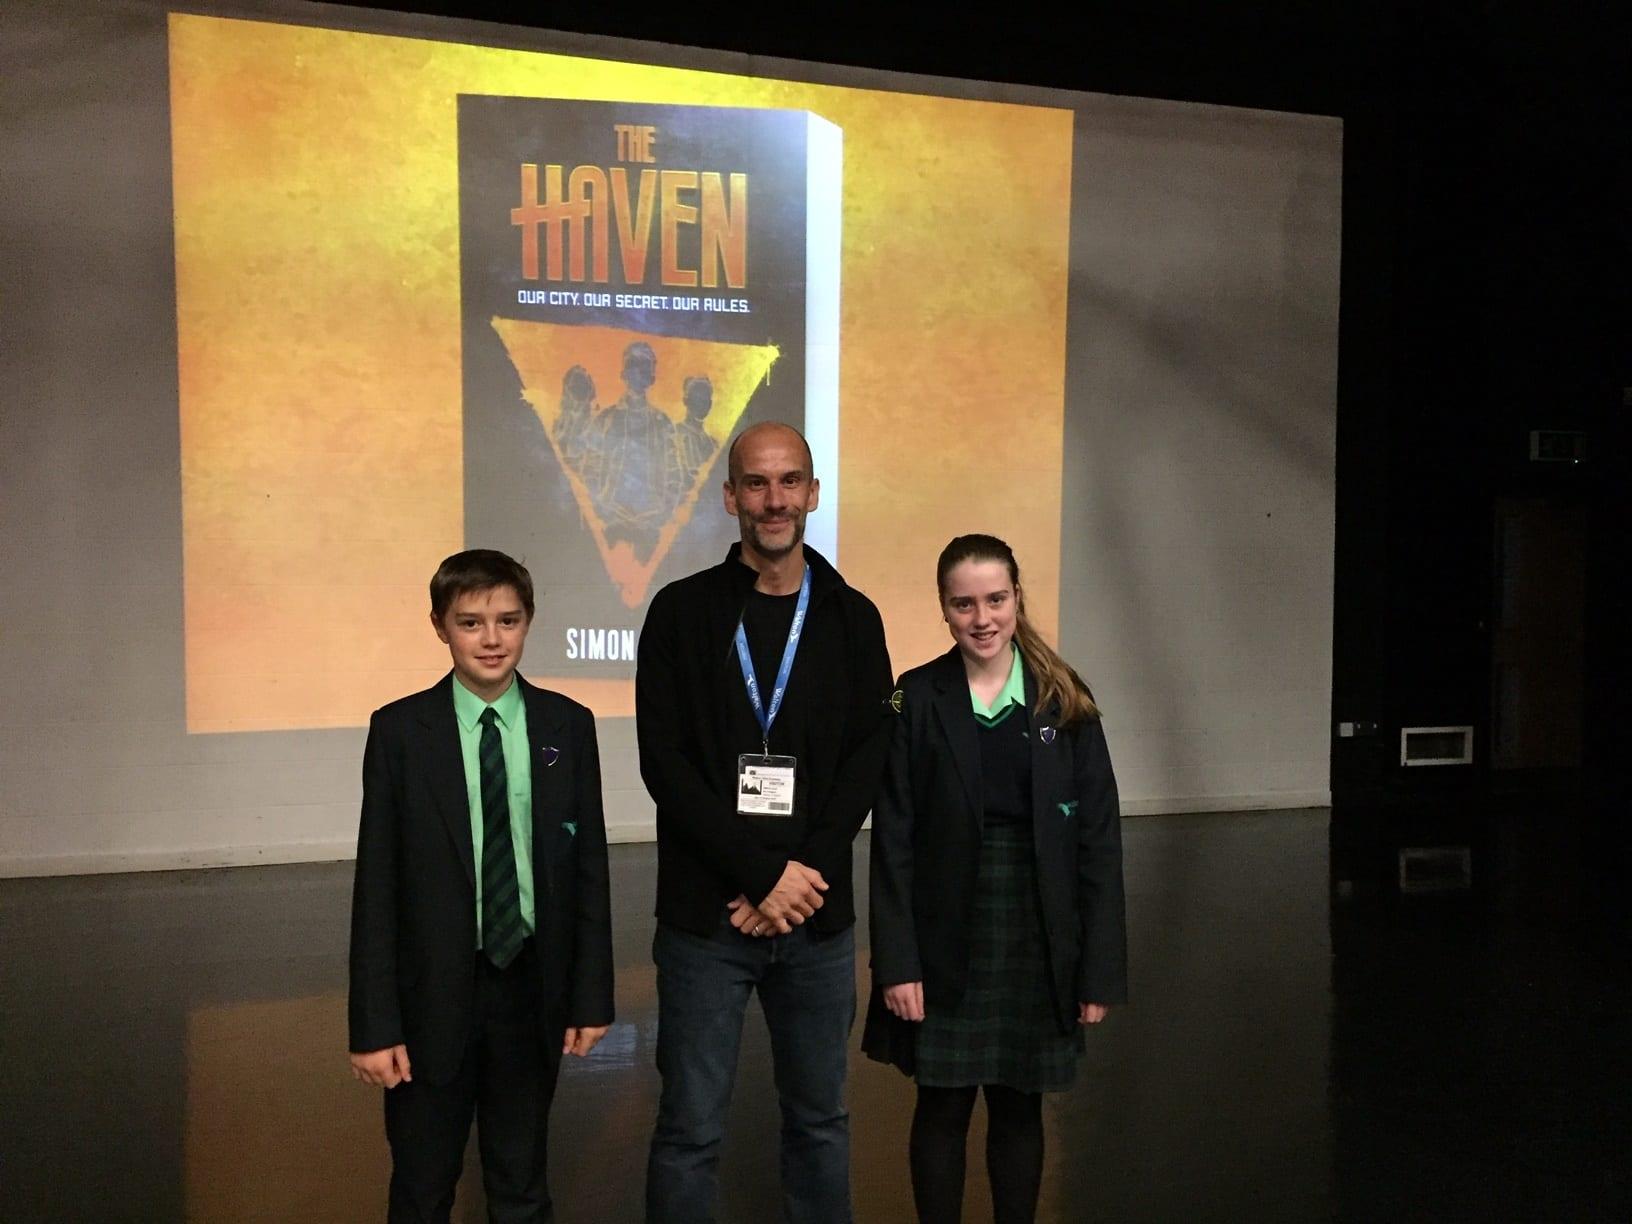 Bestselling children's author, Simon Lelic, visits Walton